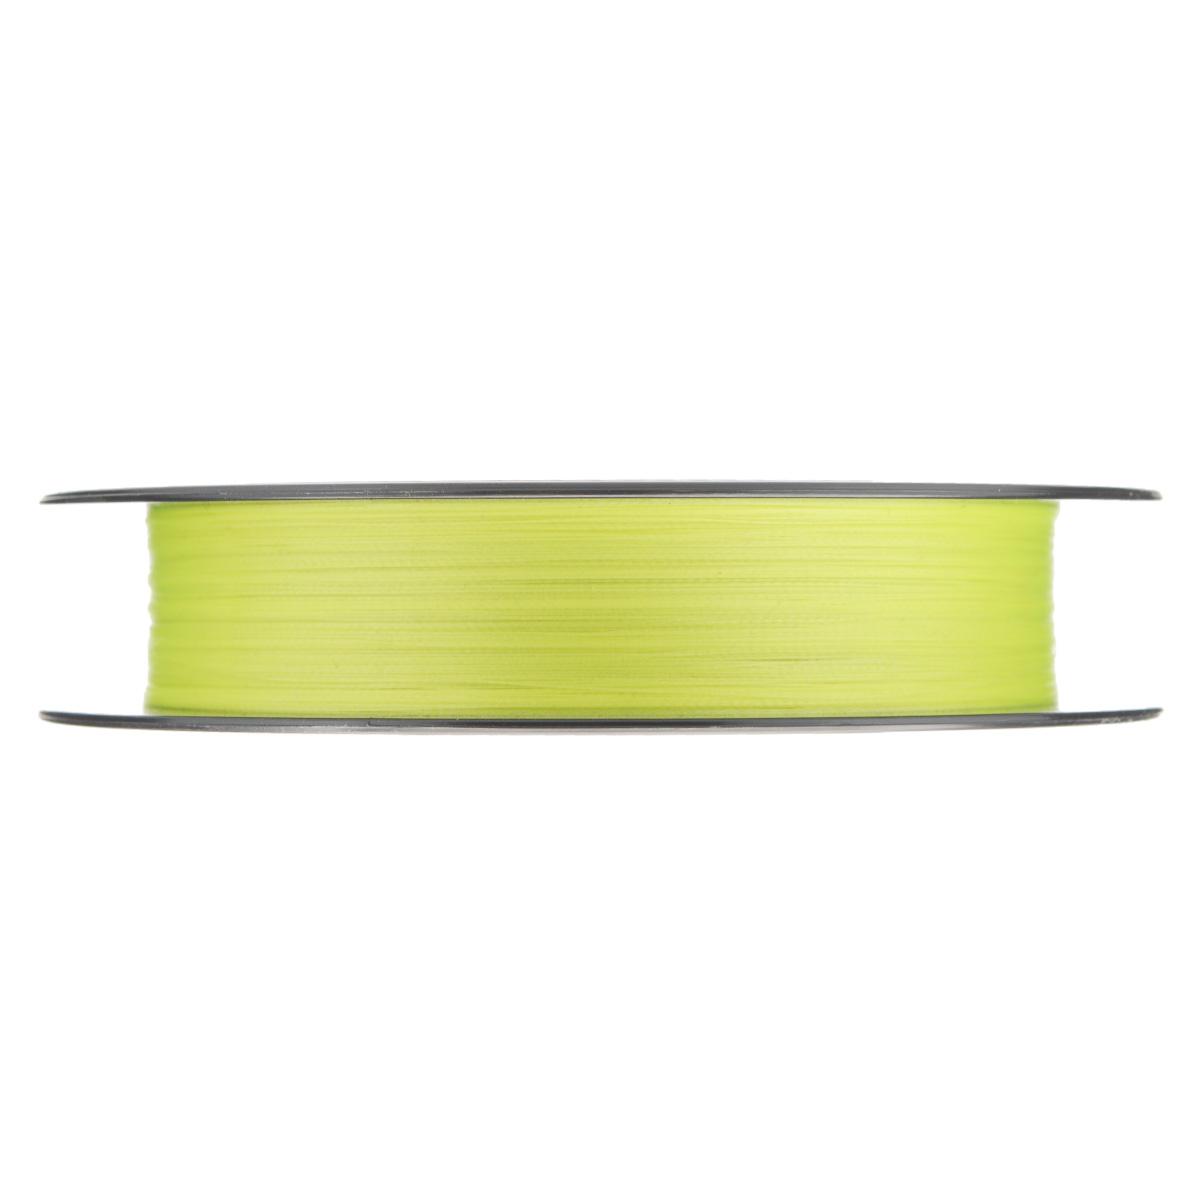 "Леска плетеная Allvega ""Bullit Braid"", цвет: ярко-желтая, 92 м, 0,08 мм, 4,5 кг"